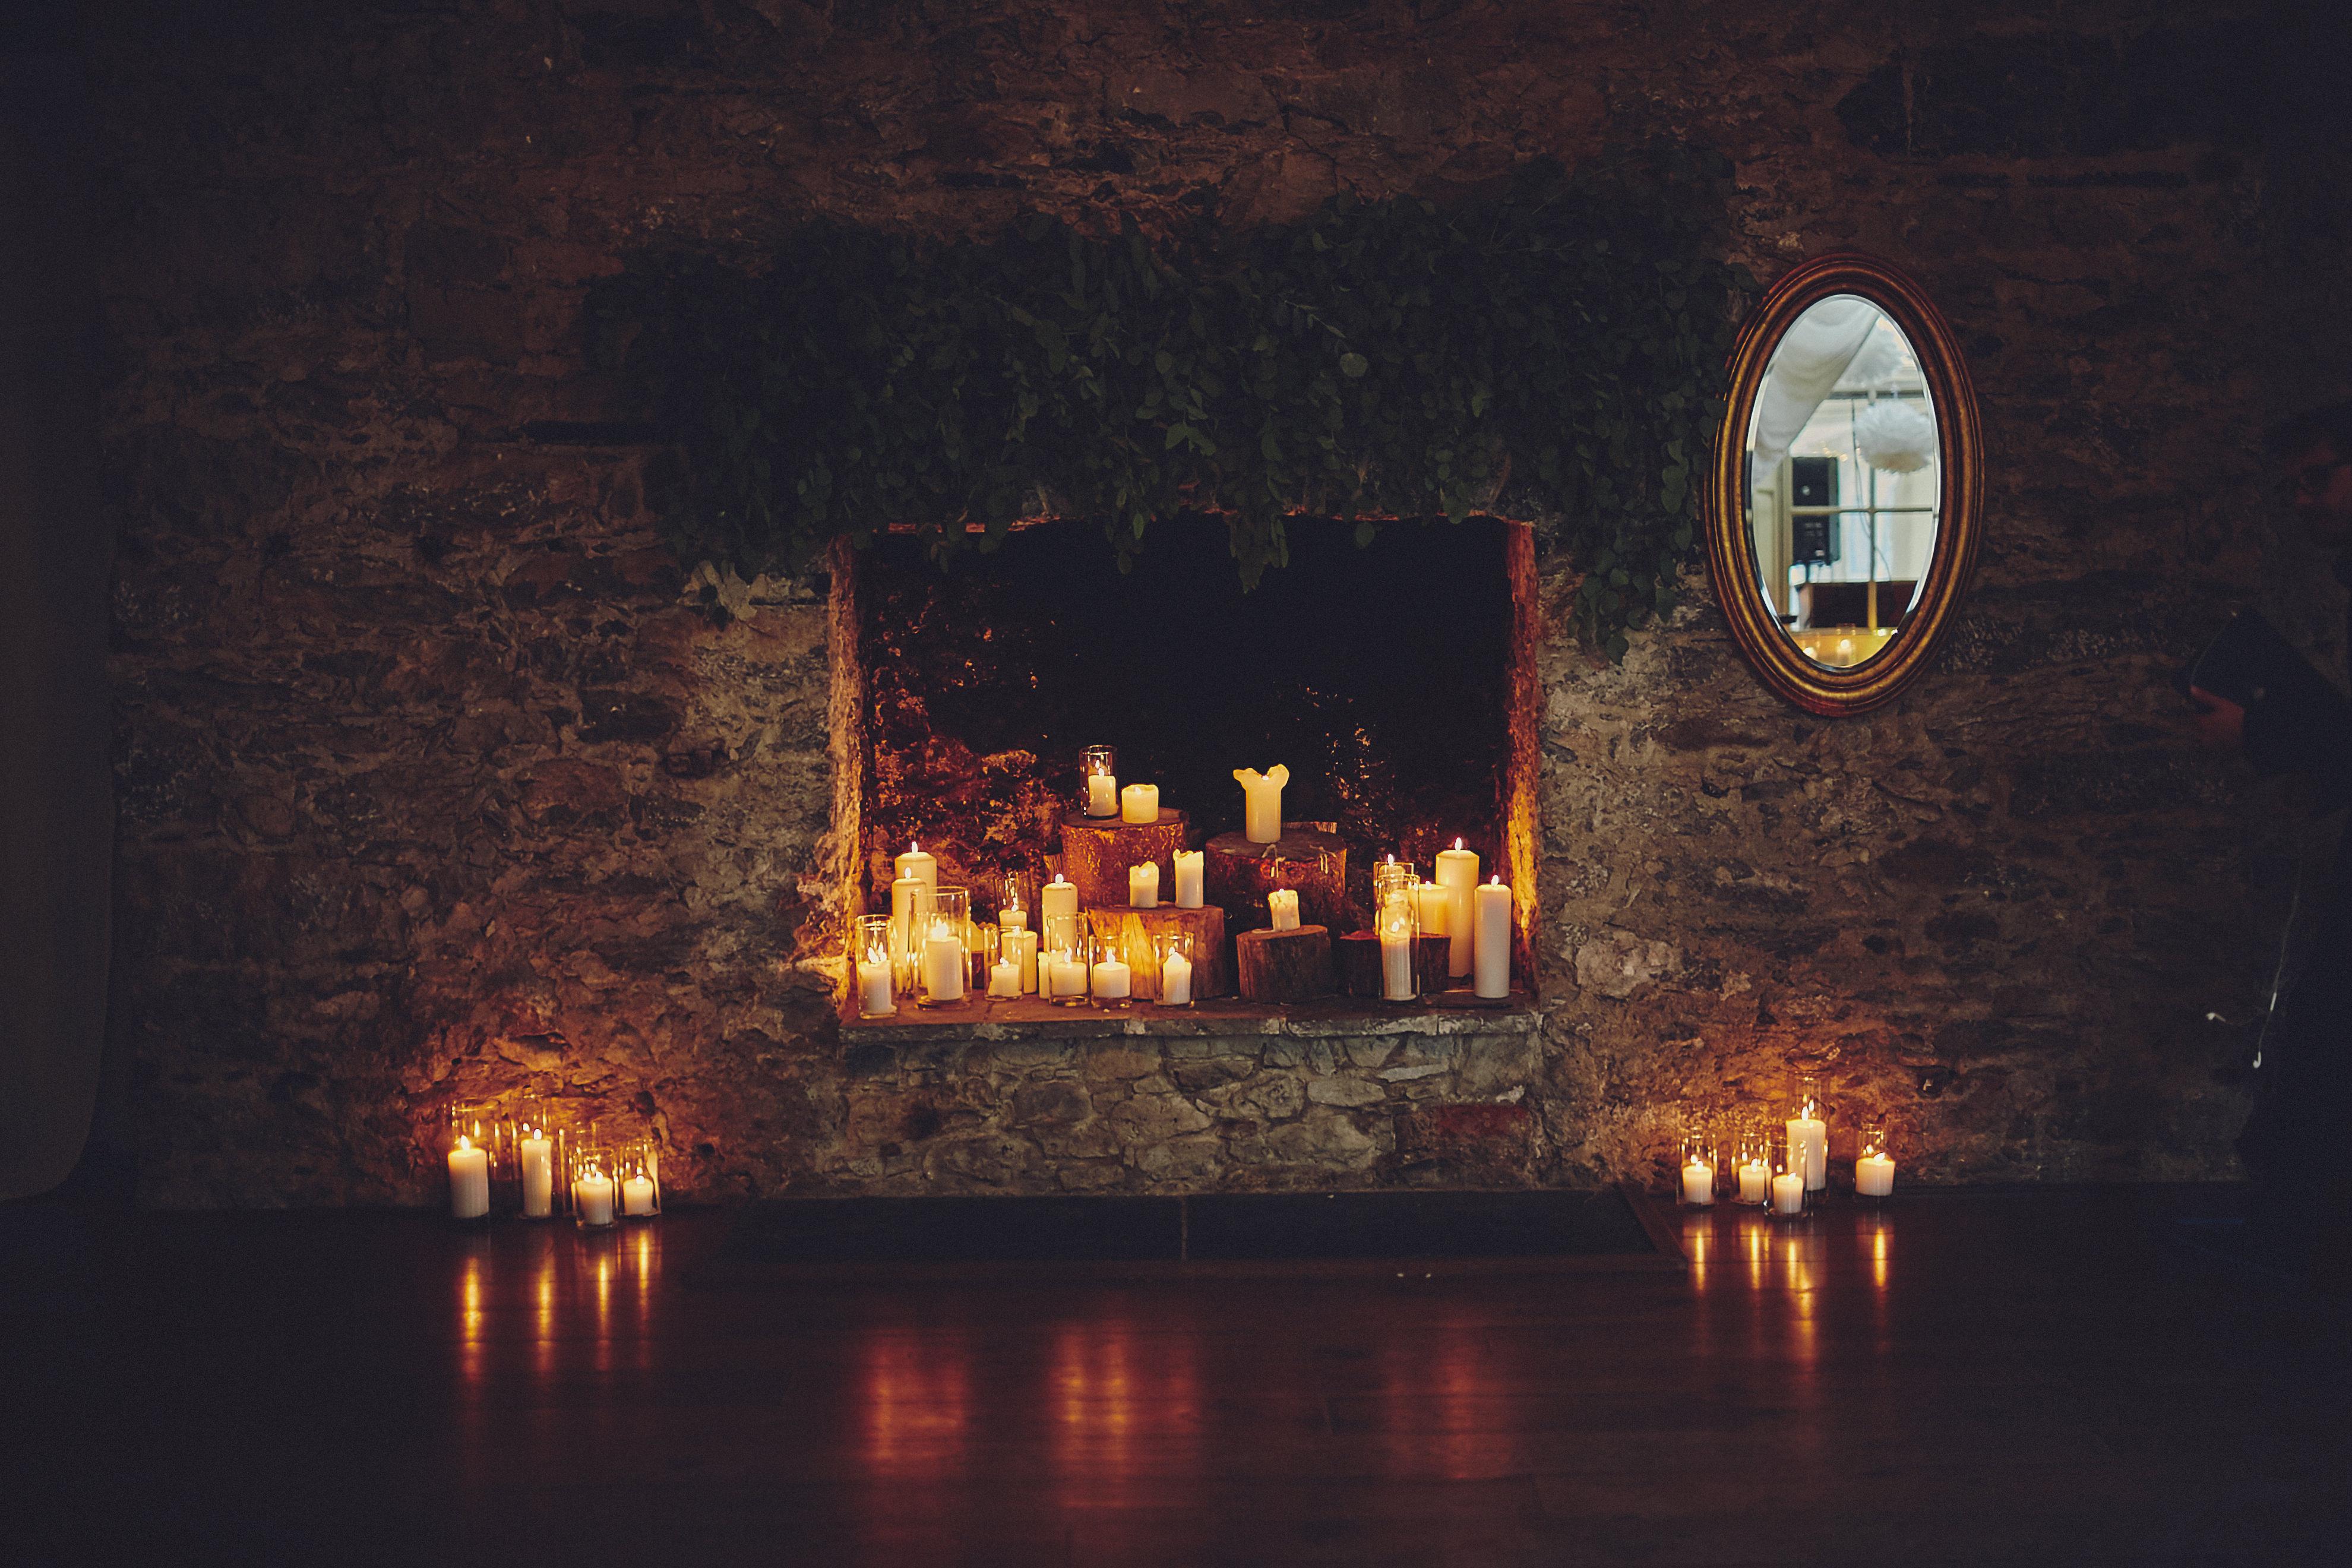 Cloughjordan House weddding126 - Cloughjordan House Wedding - Alternative Venue